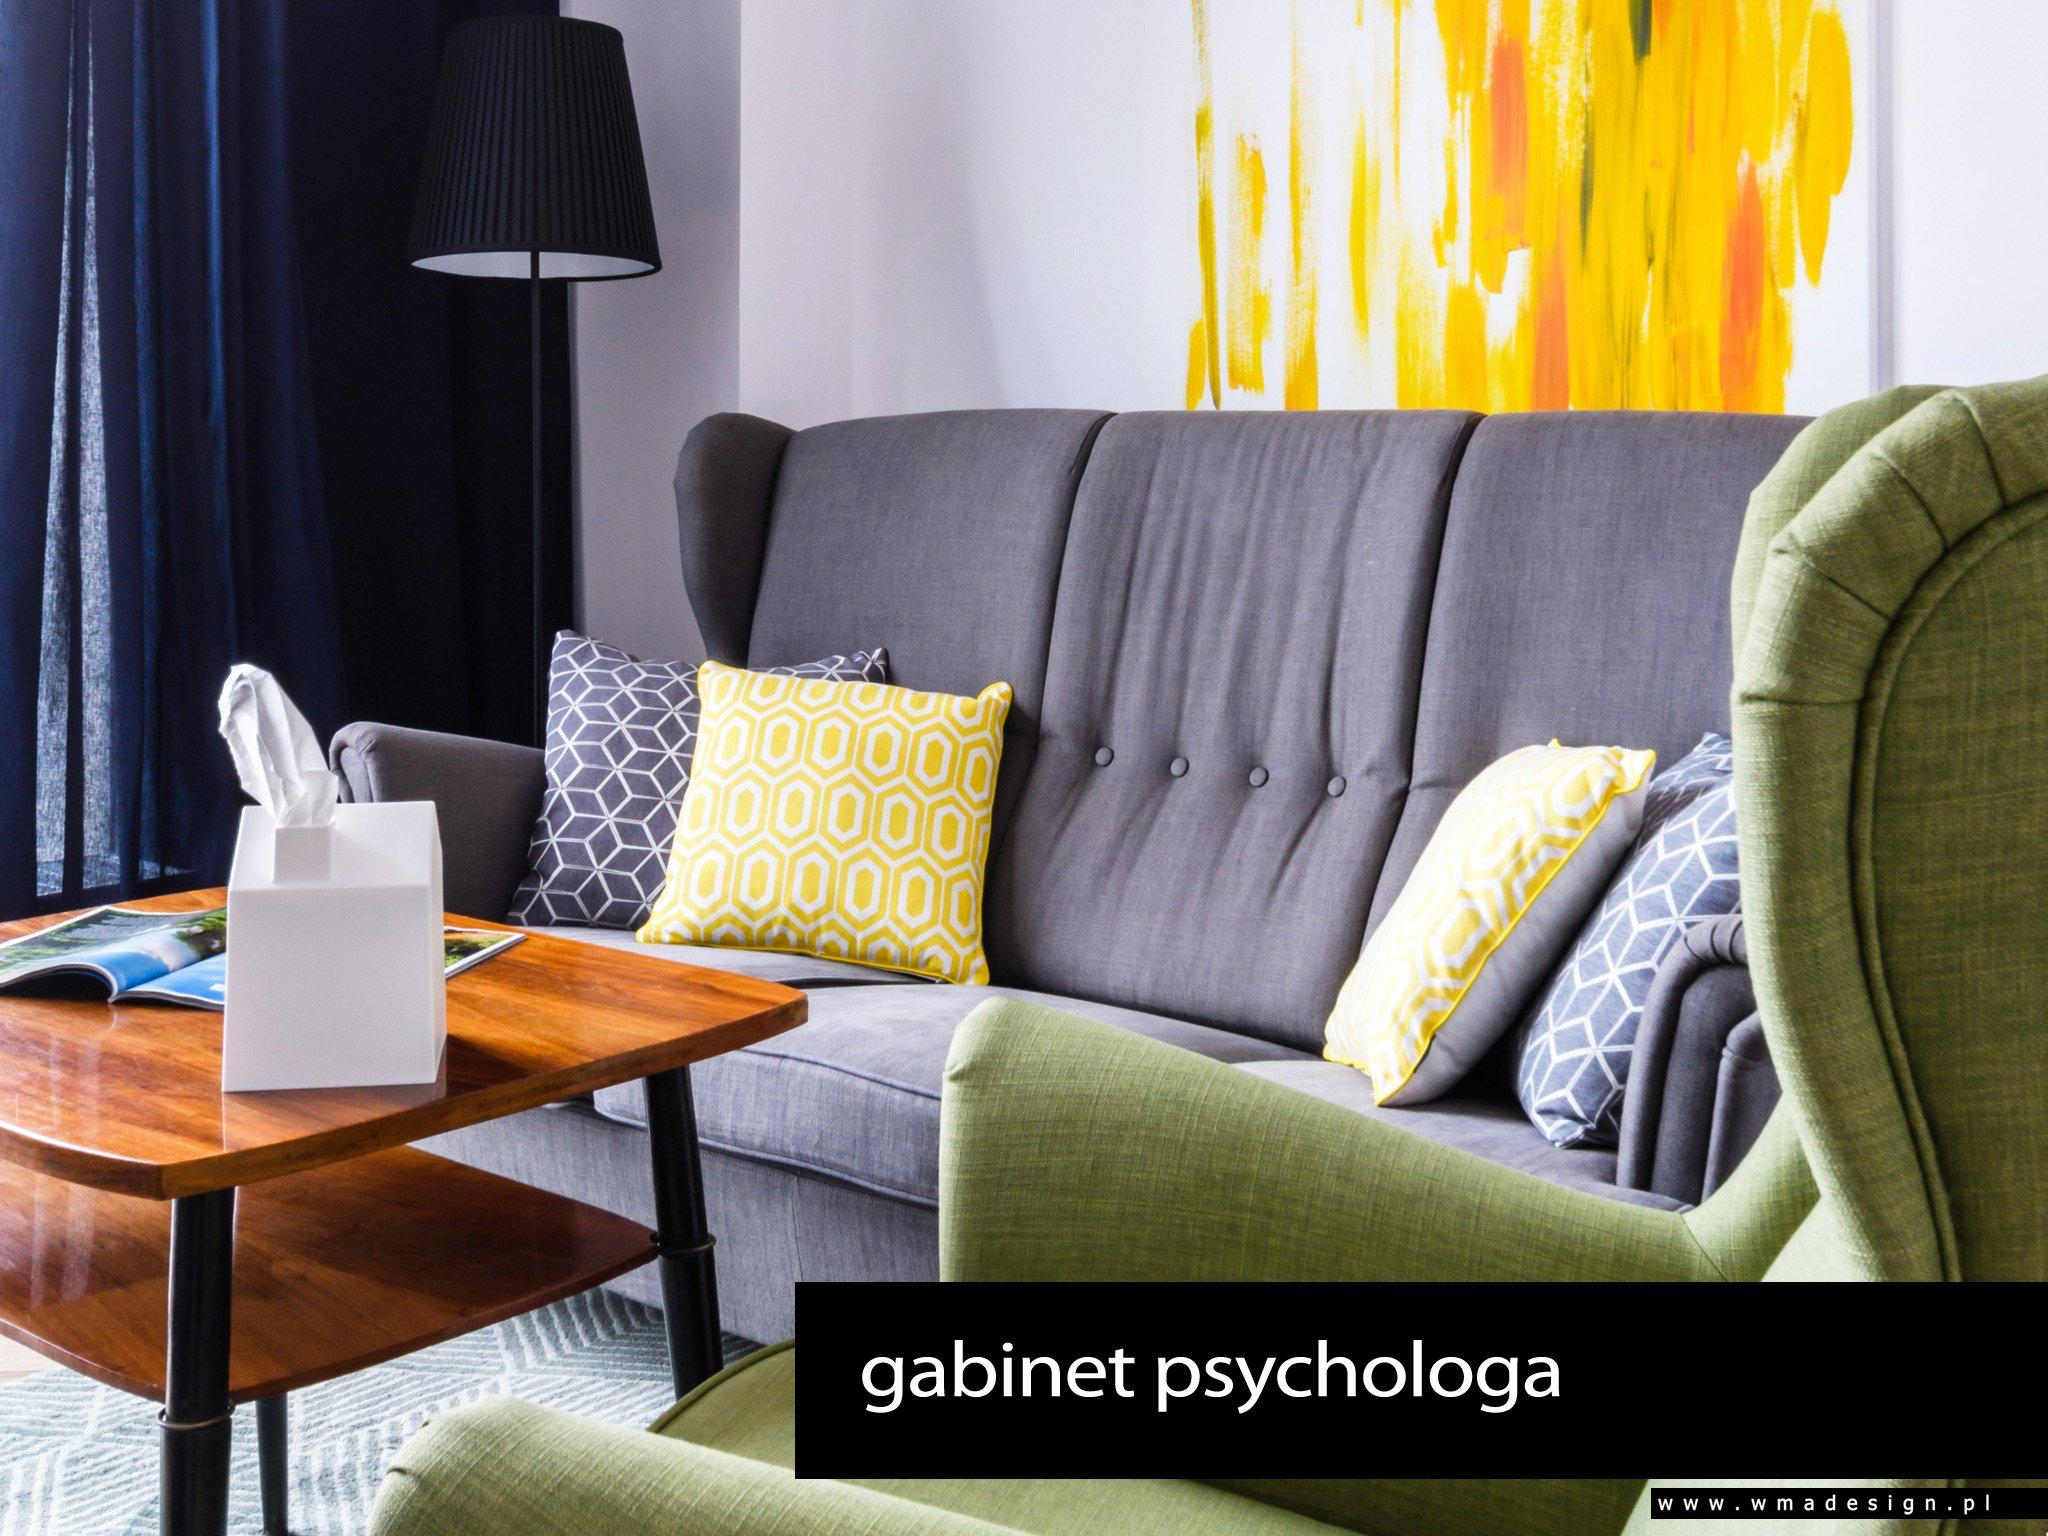 projekt_gabinetu_psychologicznego_gabinet_psychologa_psycholog_Warszawa_WMA_Design